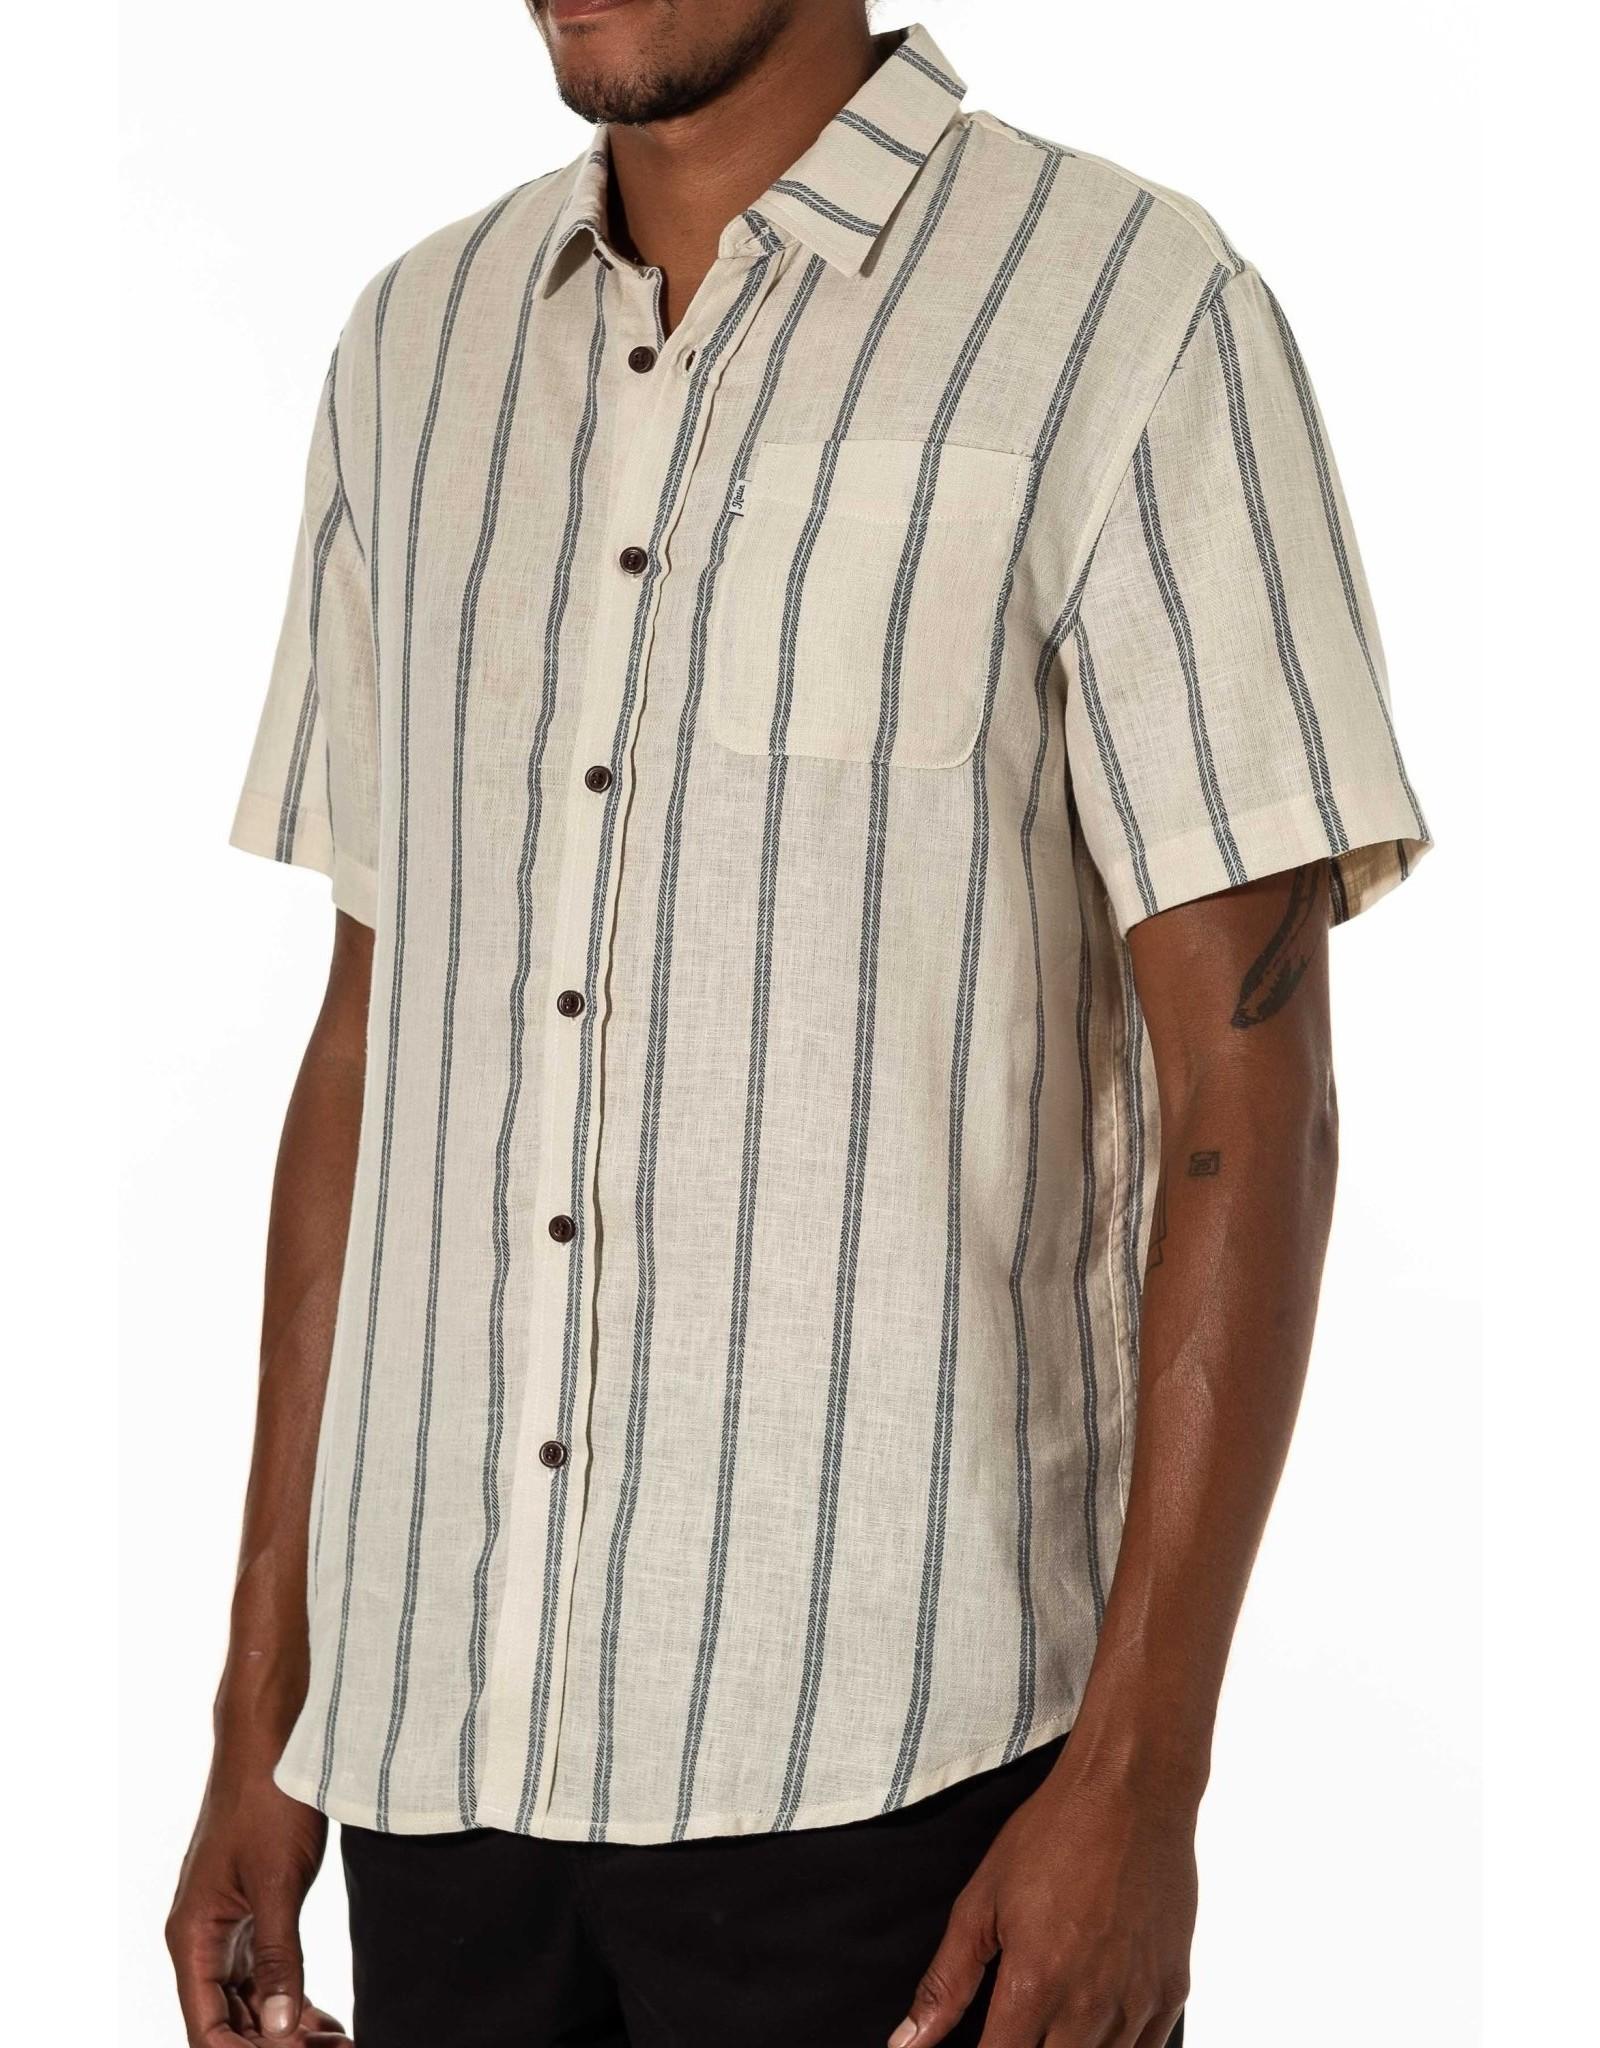 KATIN Allen Shirt